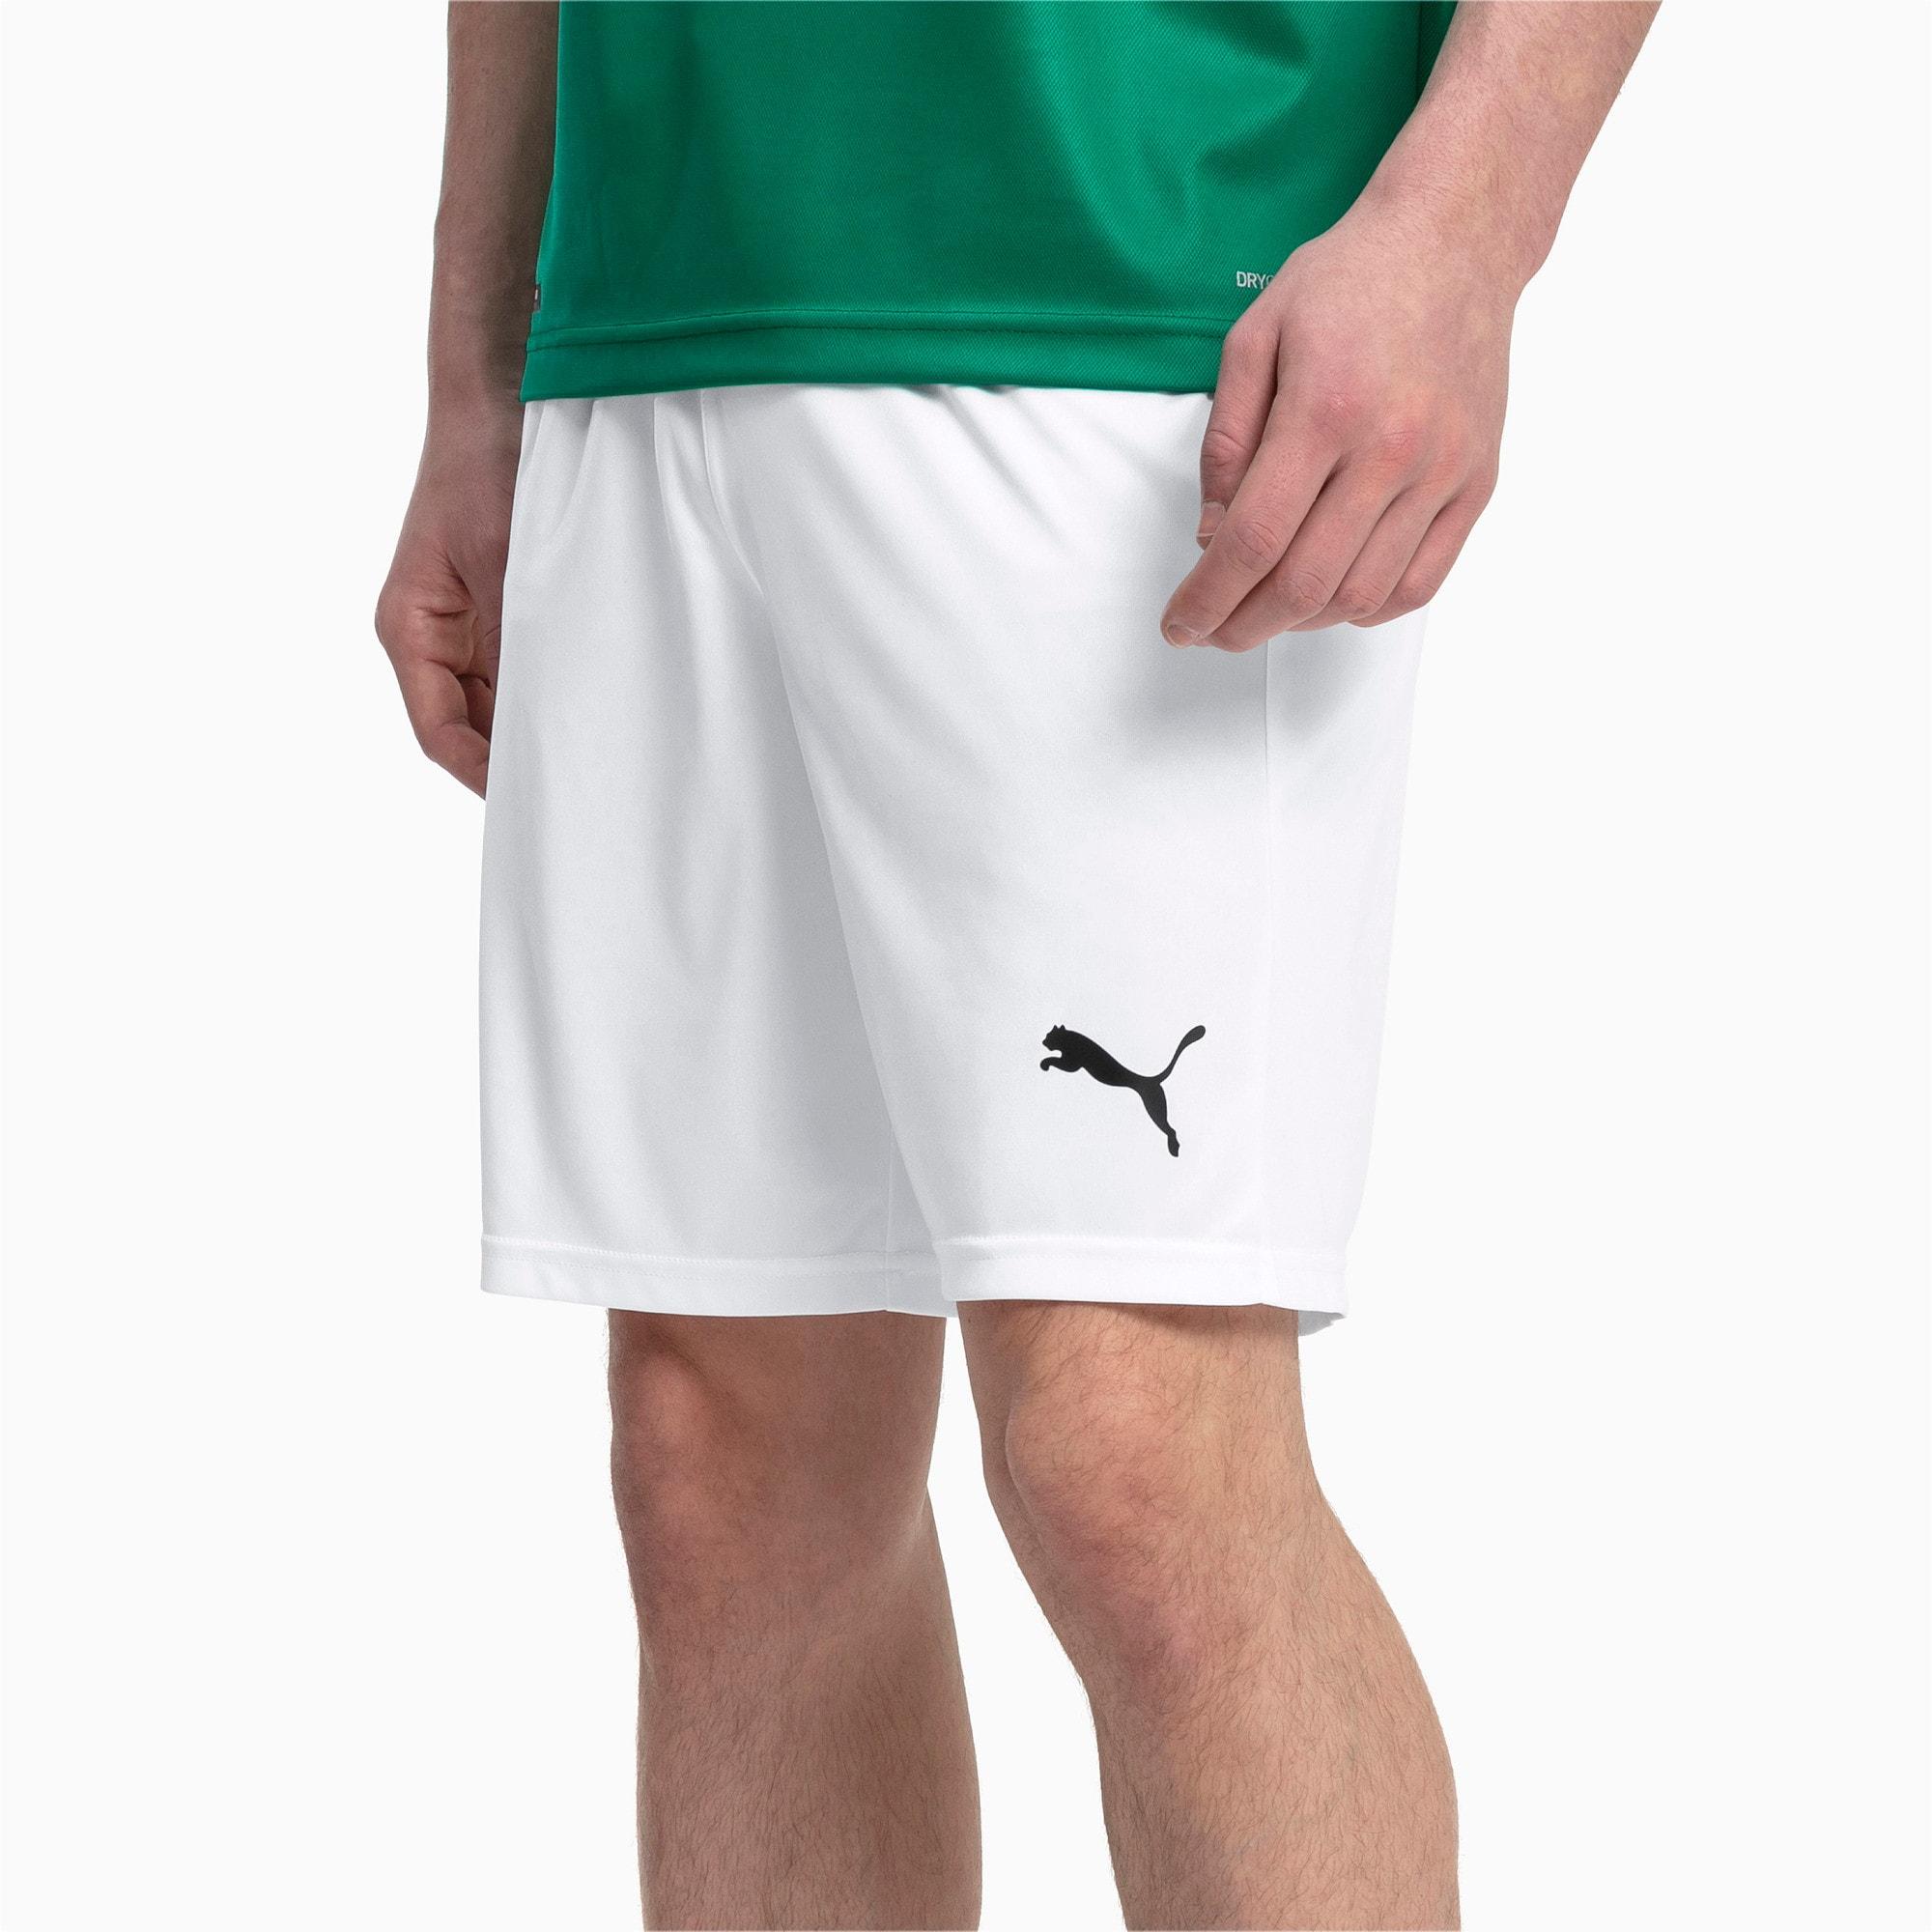 Thumbnail 1 of Liga Core Men's Shorts, Puma White-Puma Black, medium